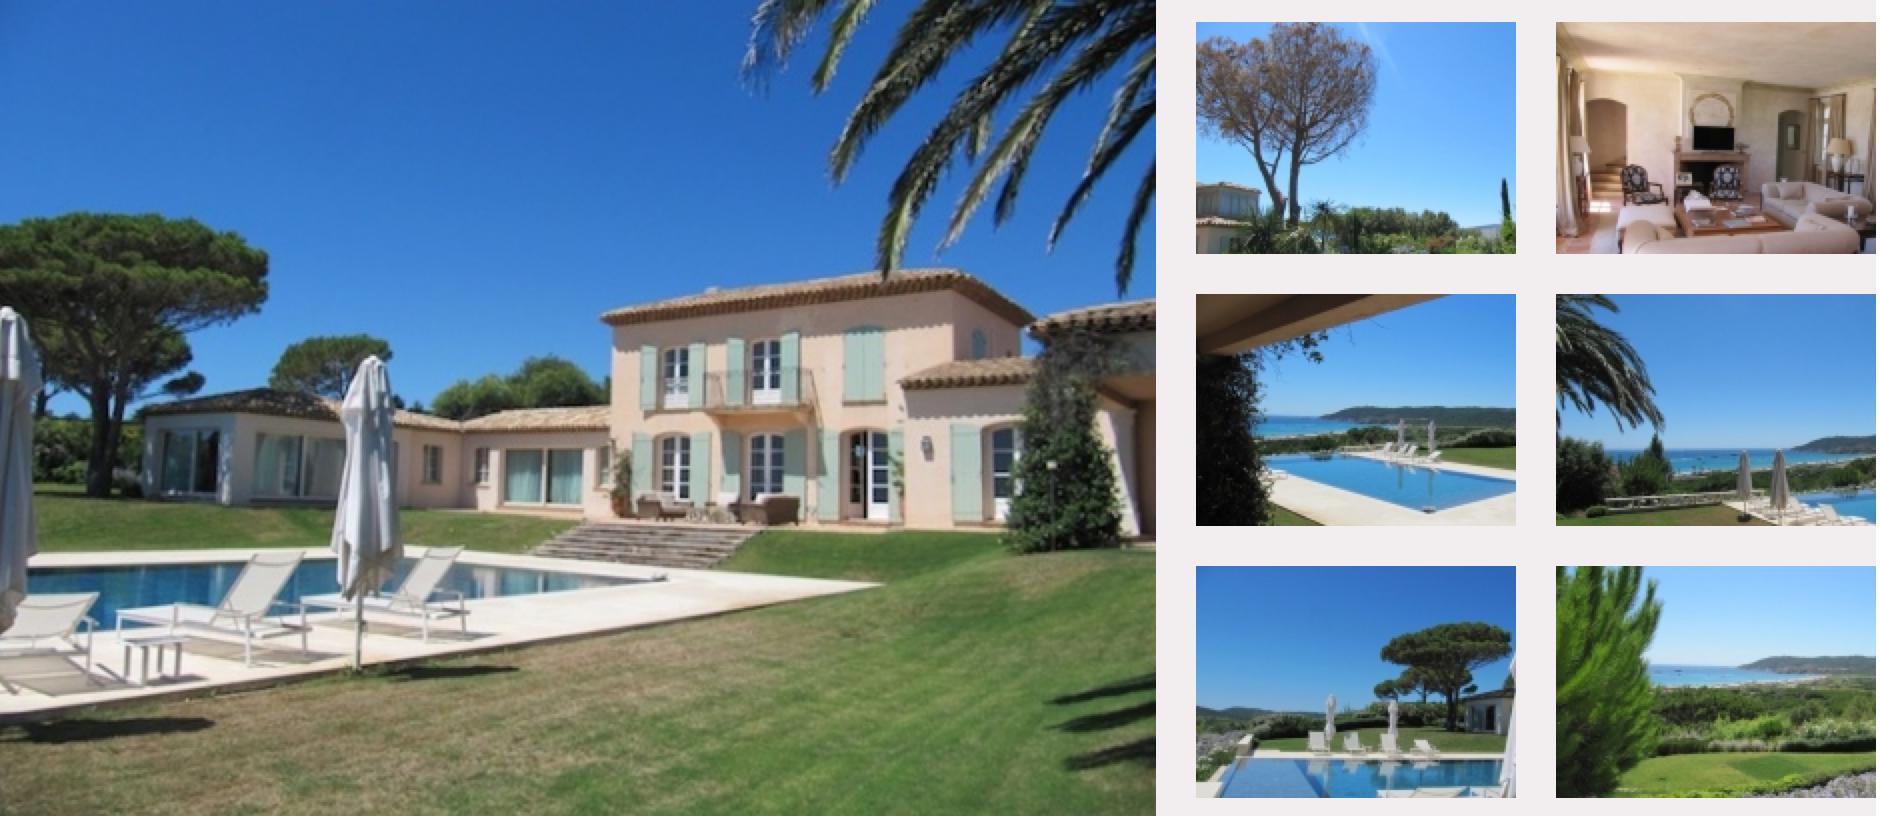 Villa Pampelone bay St Tropez